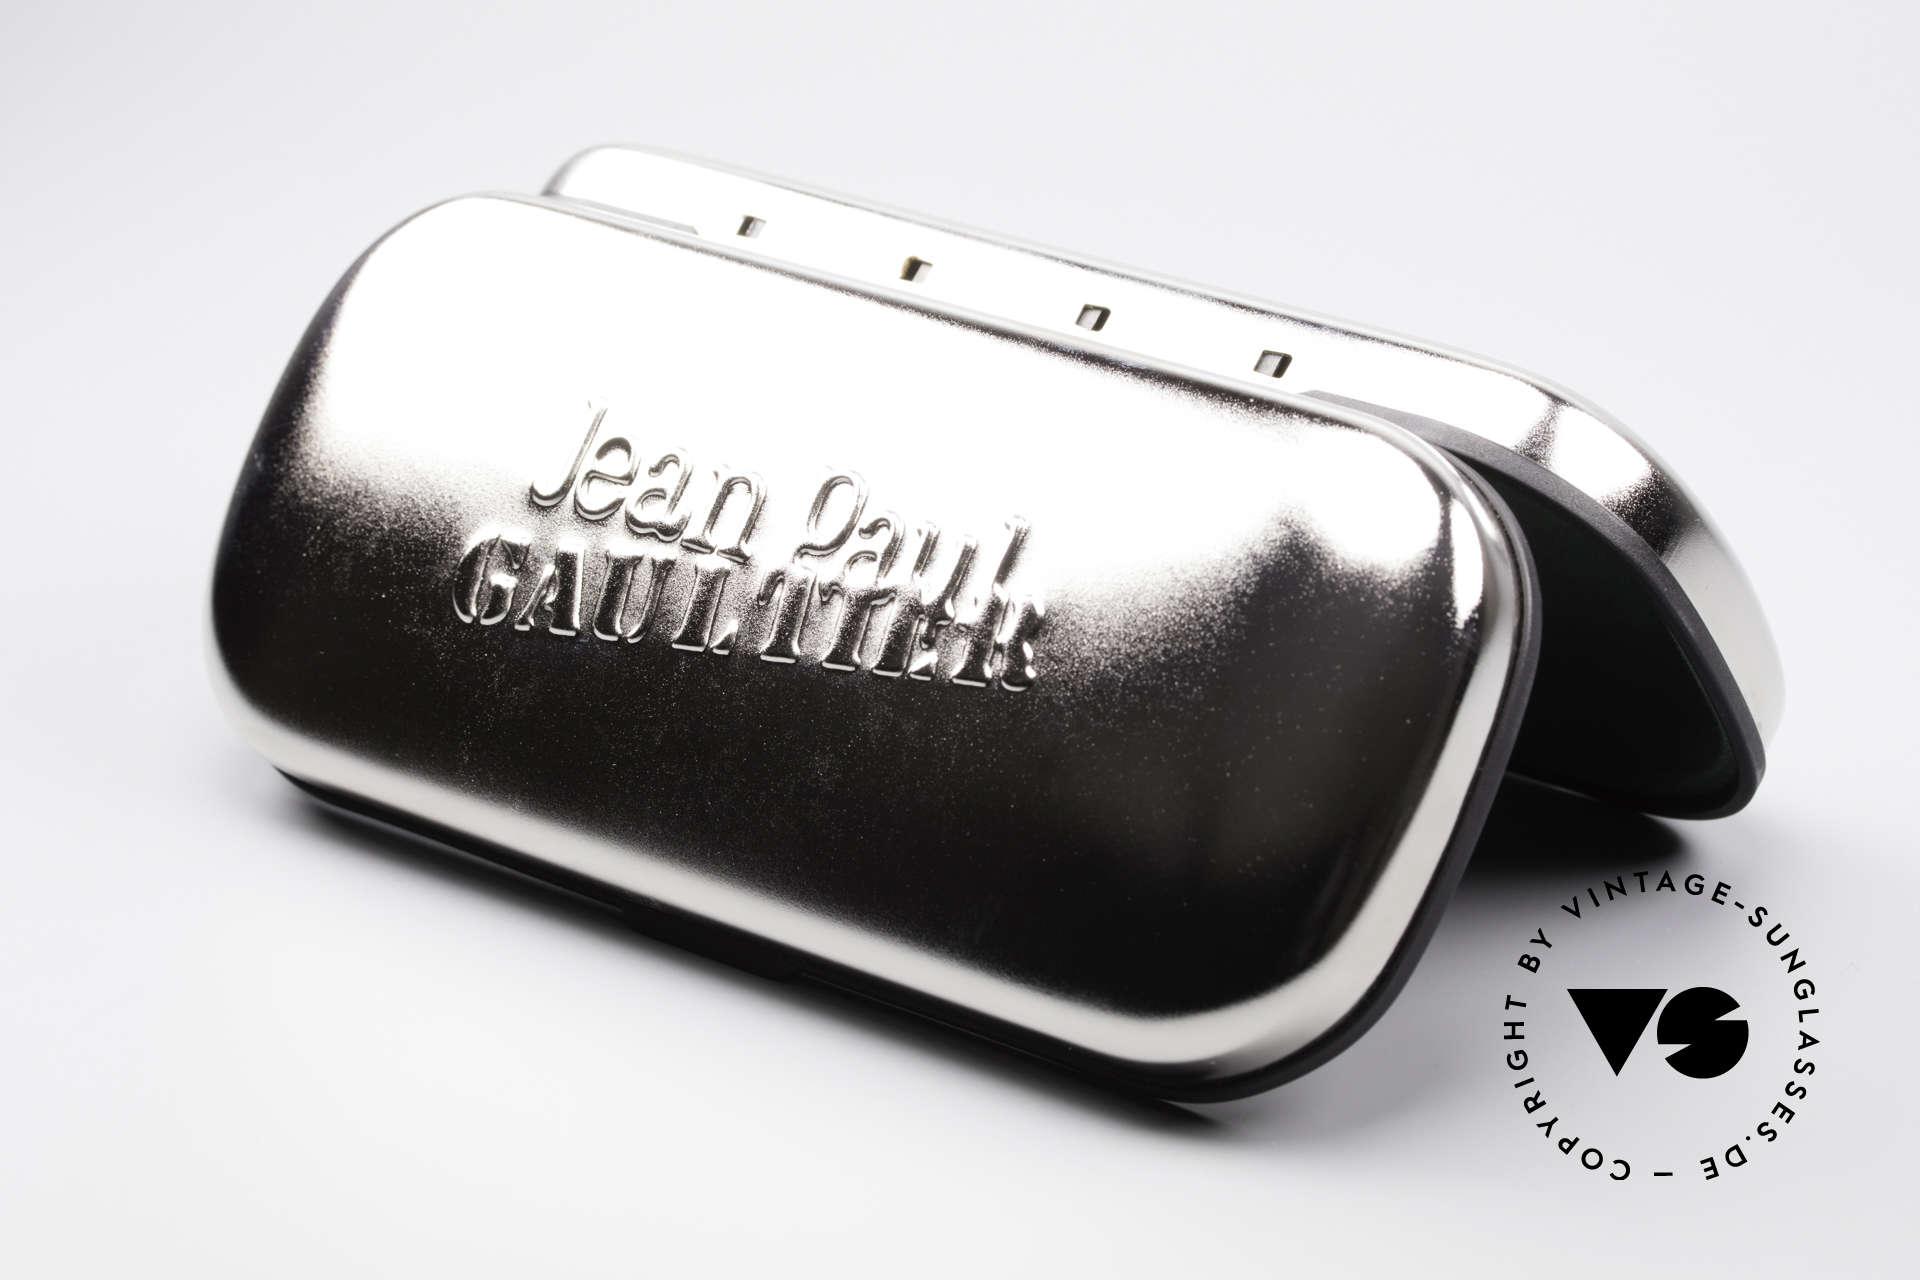 Jean Paul Gaultier 58-5104 Oval Designer Sunglasses, Size: medium, Made for Men and Women